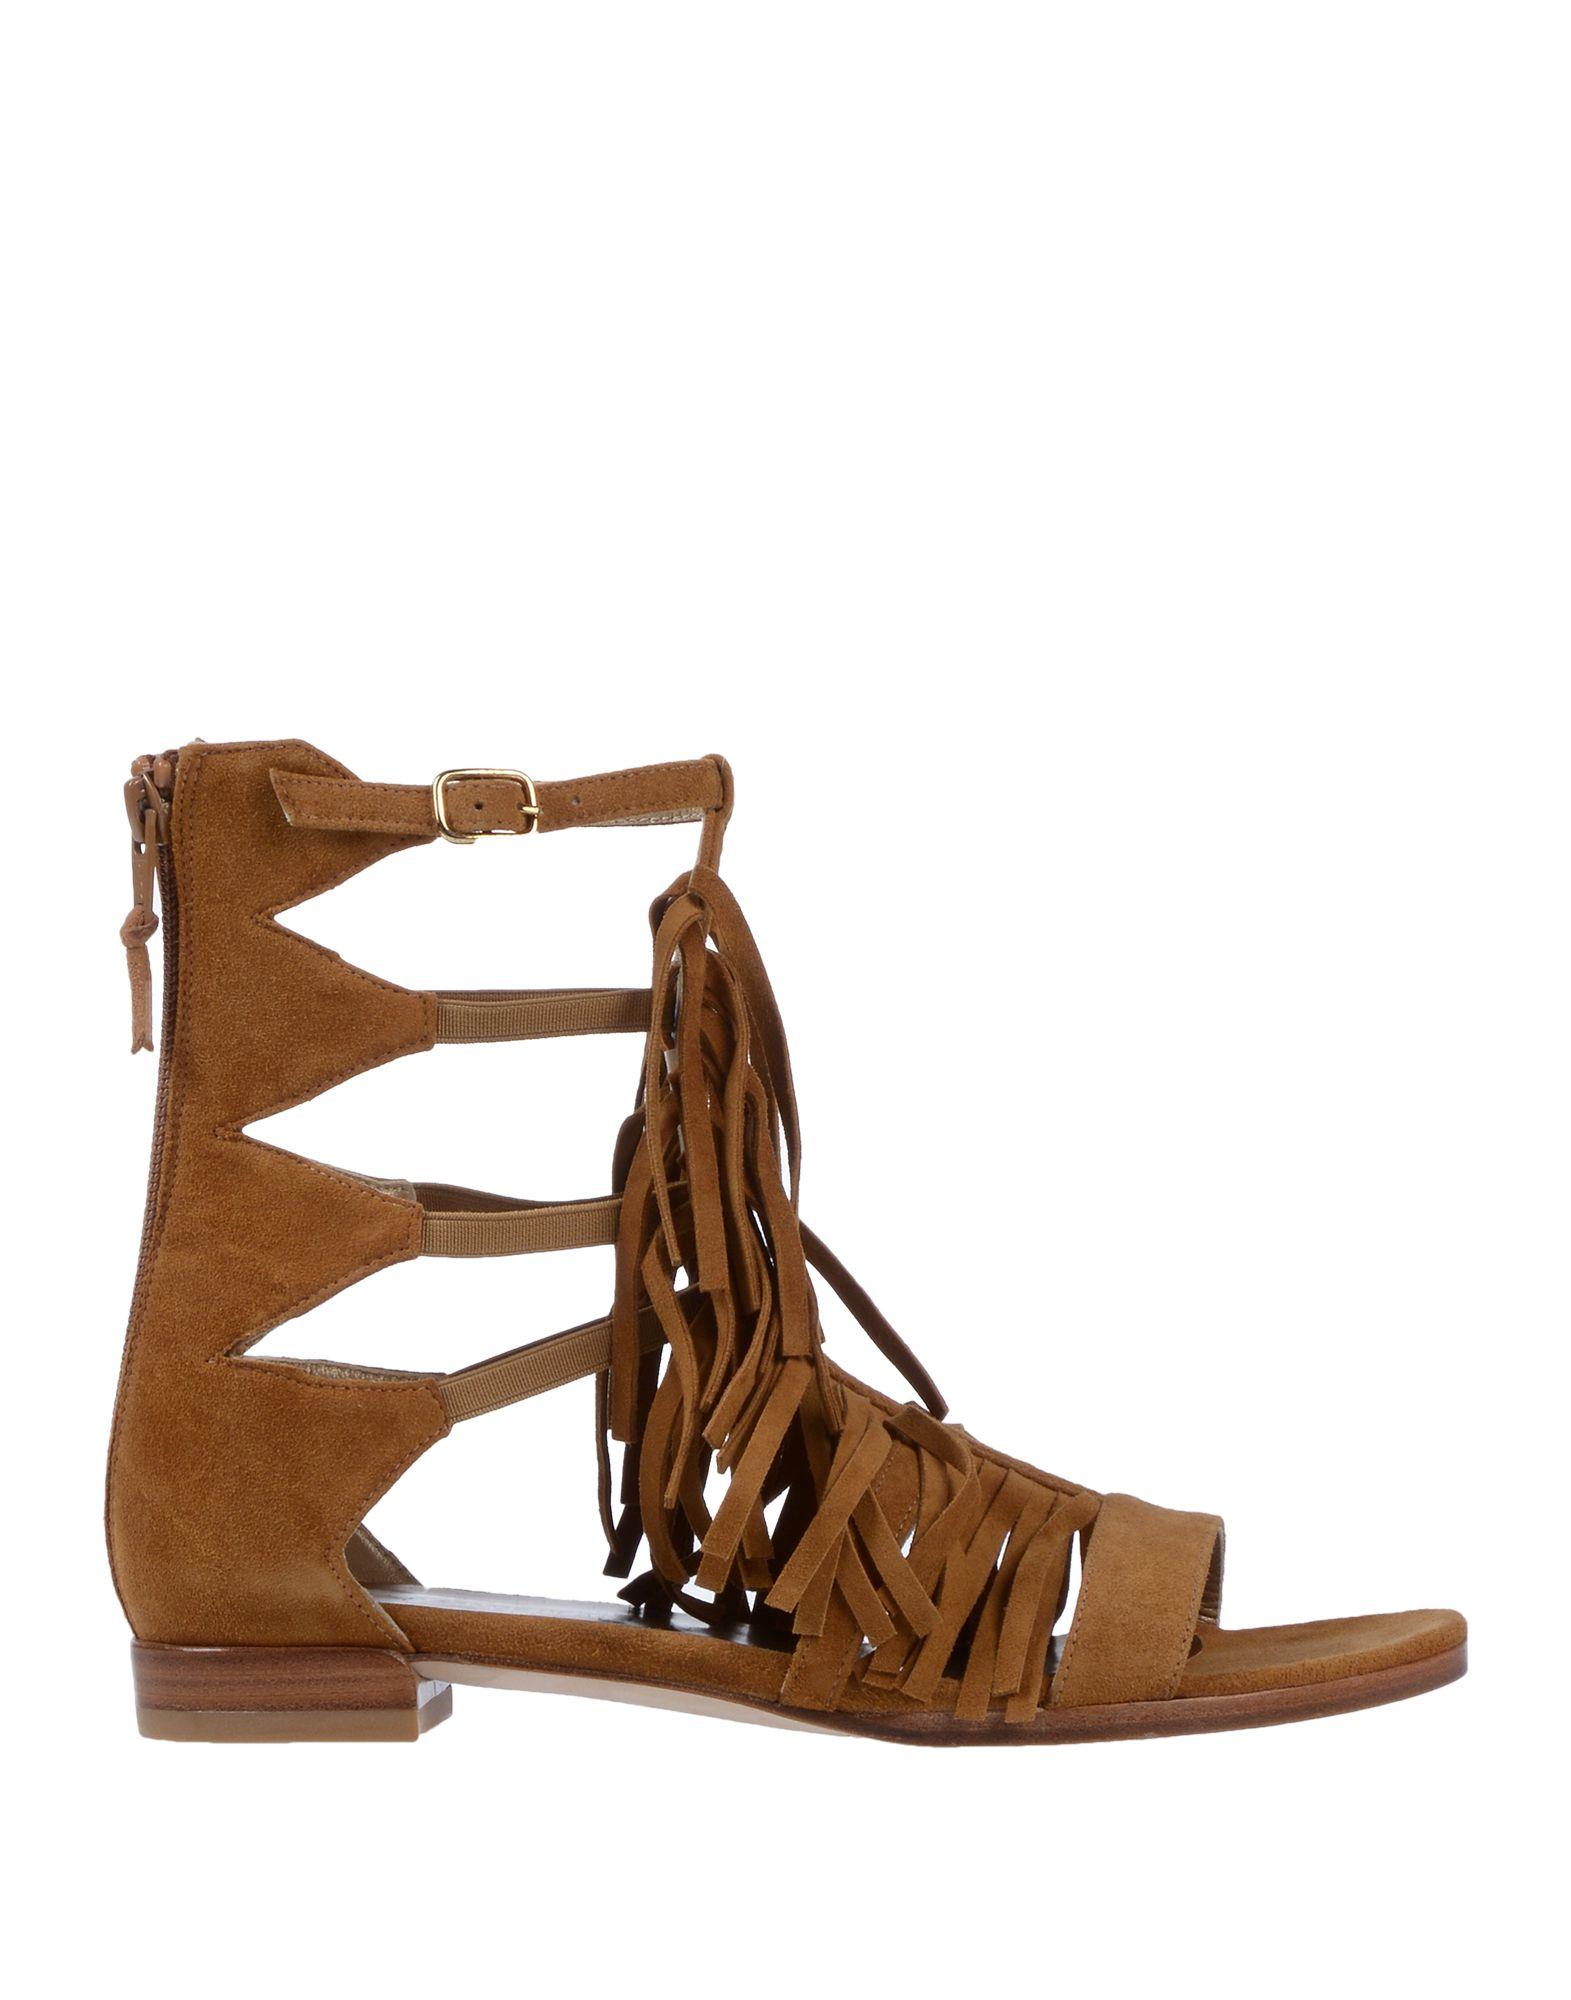 Stuart Weitzman Ankle Boot - Women Stuart Weitzman  Ankle Boots online on  Weitzman United Kingdom - 11331951JS 45e414